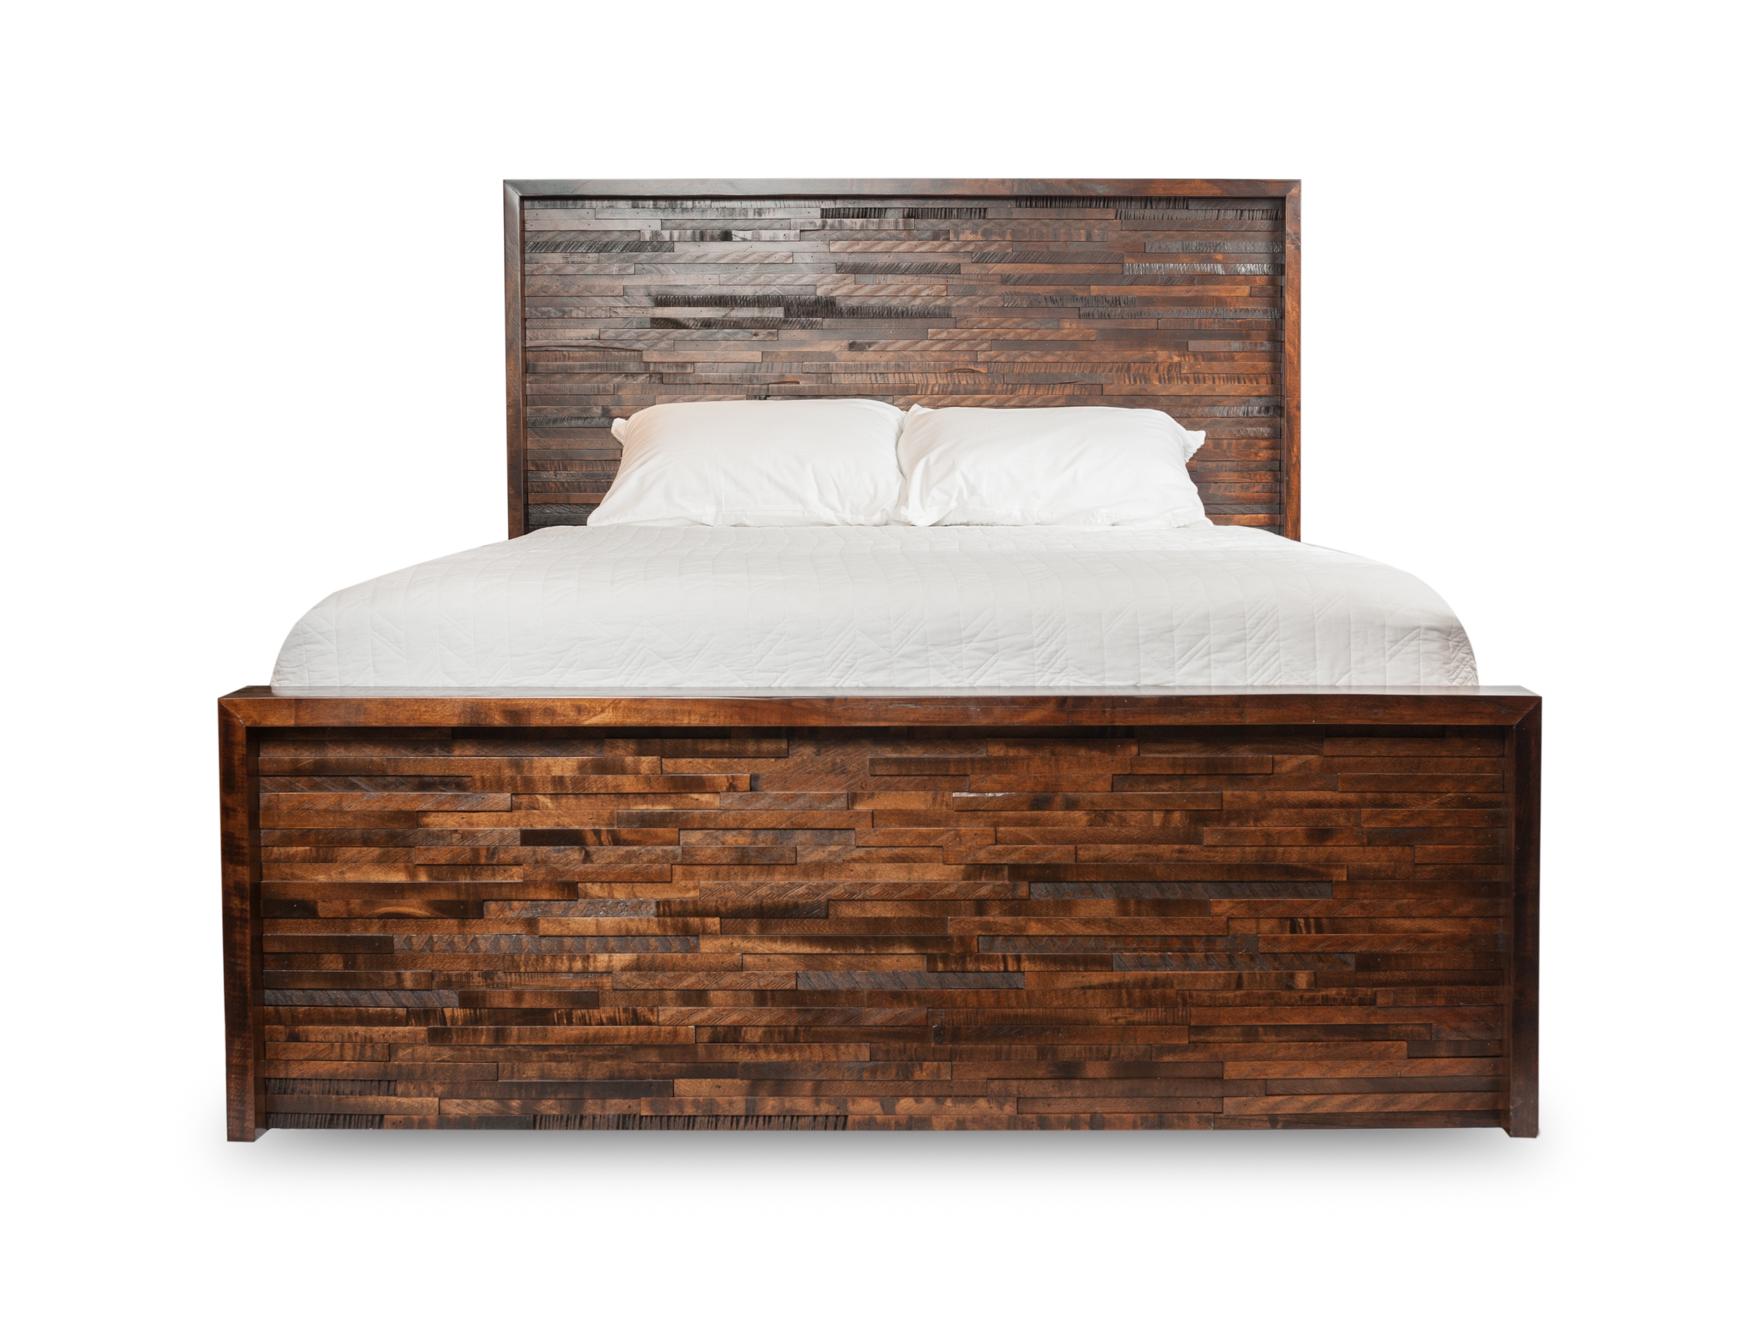 009_Woodcraft_Furniture_GreatLakesQueenBed_Frt-3.jpg